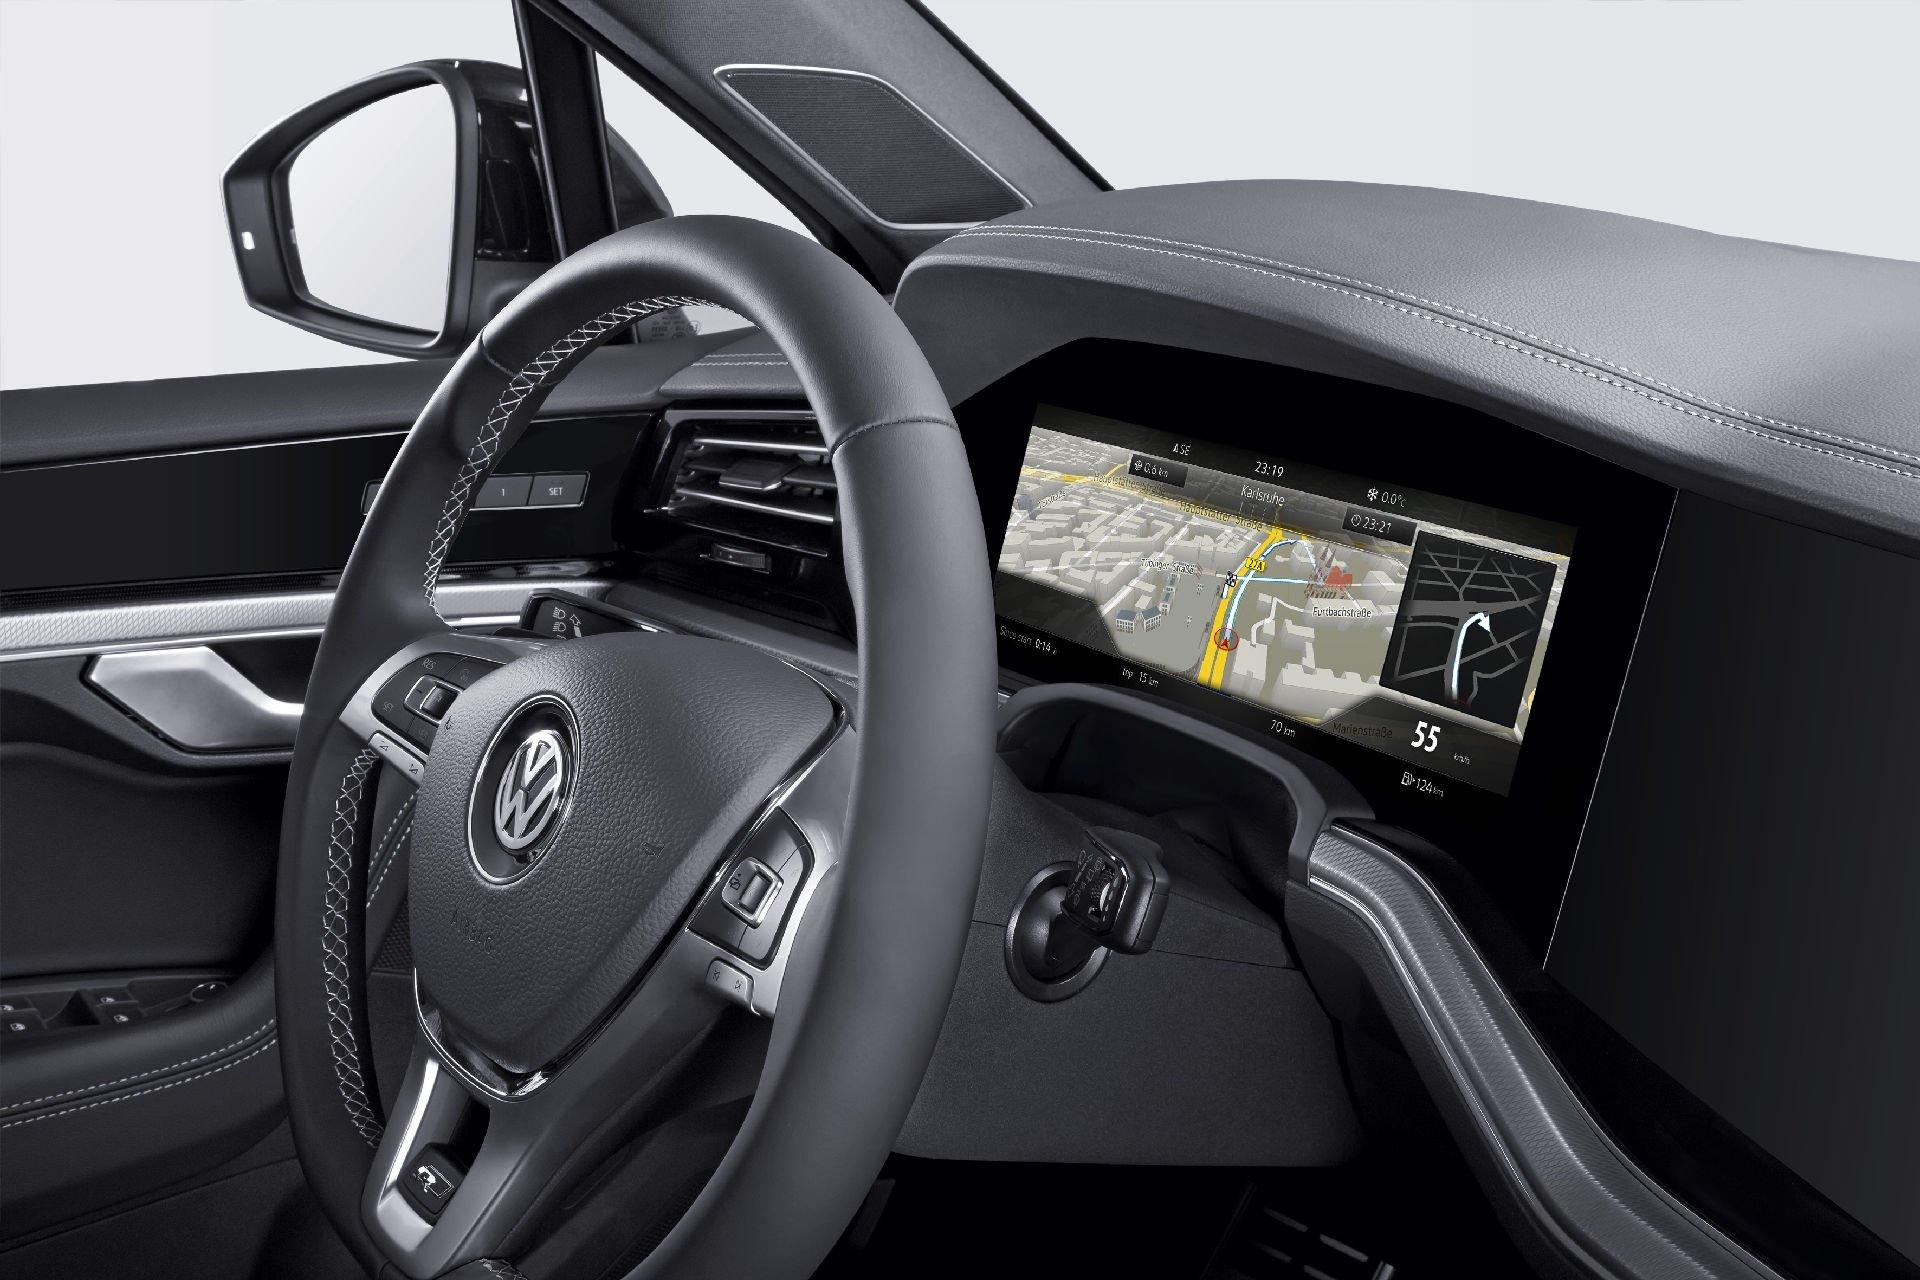 Bosch-3D-cockpit-display-4